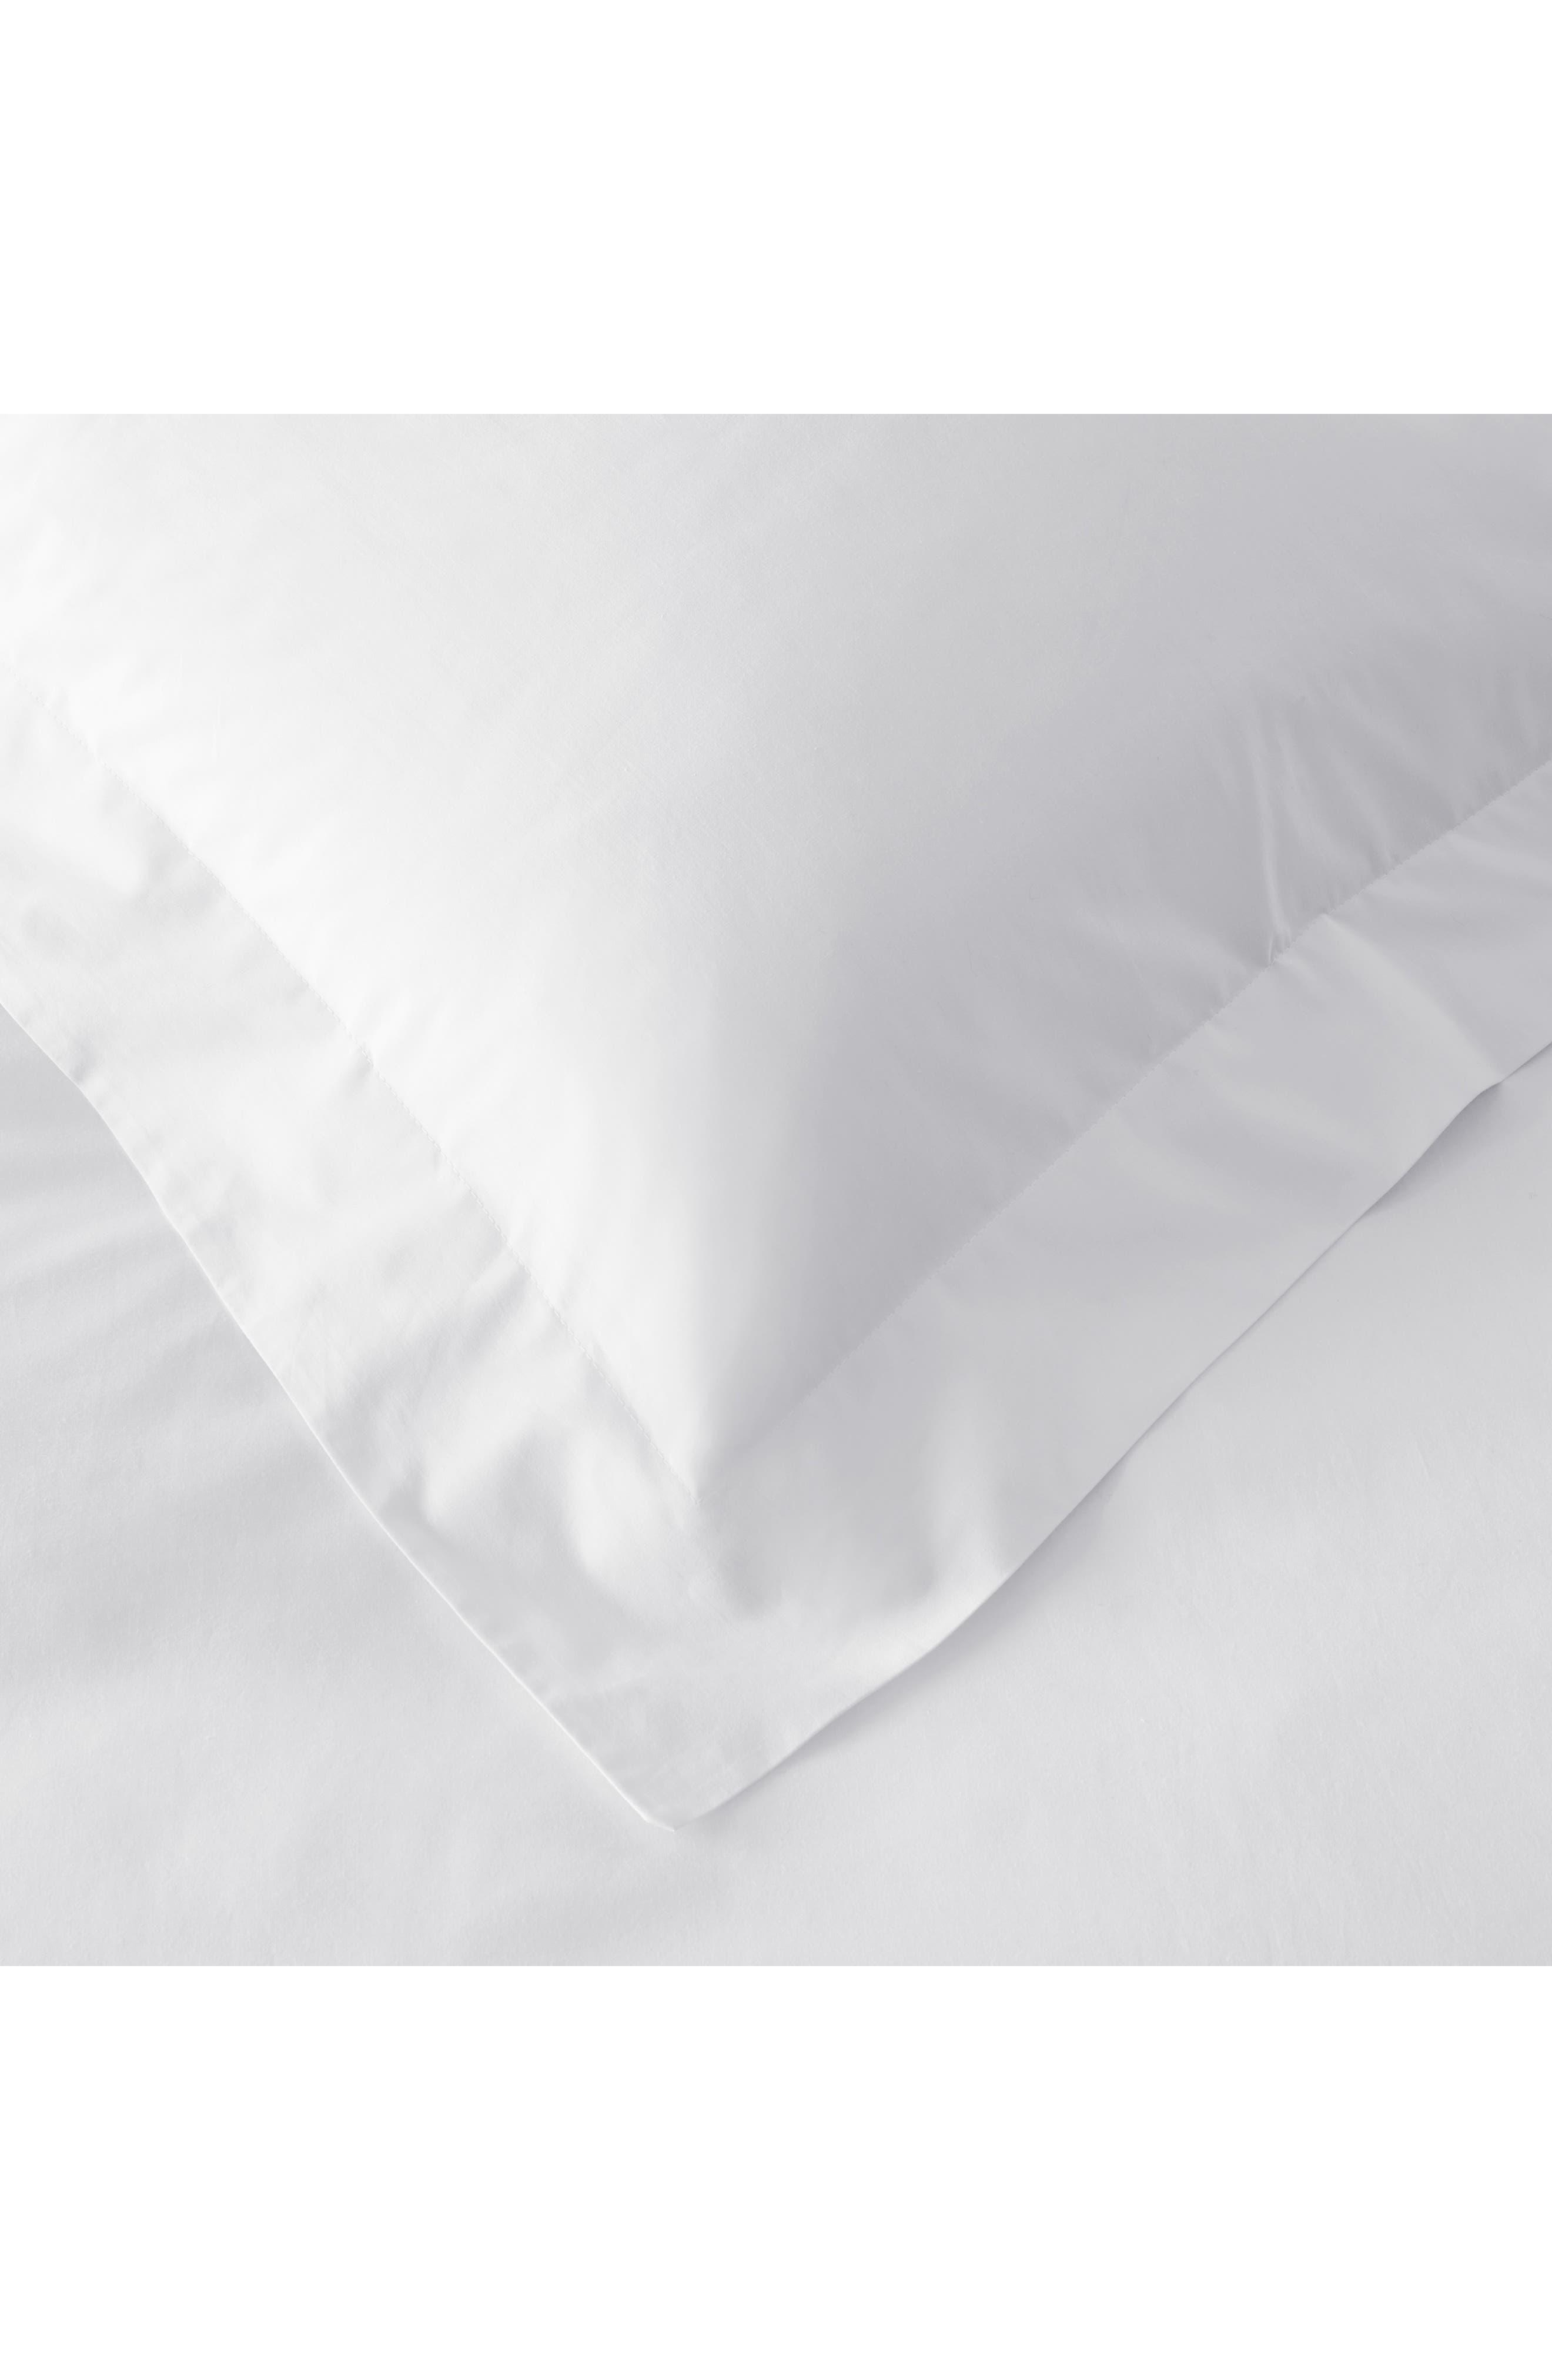 THE WHITE COMPANY, 200 Thread Count Egyptian Cotton Flat Sheet, Alternate thumbnail 2, color, WHITE